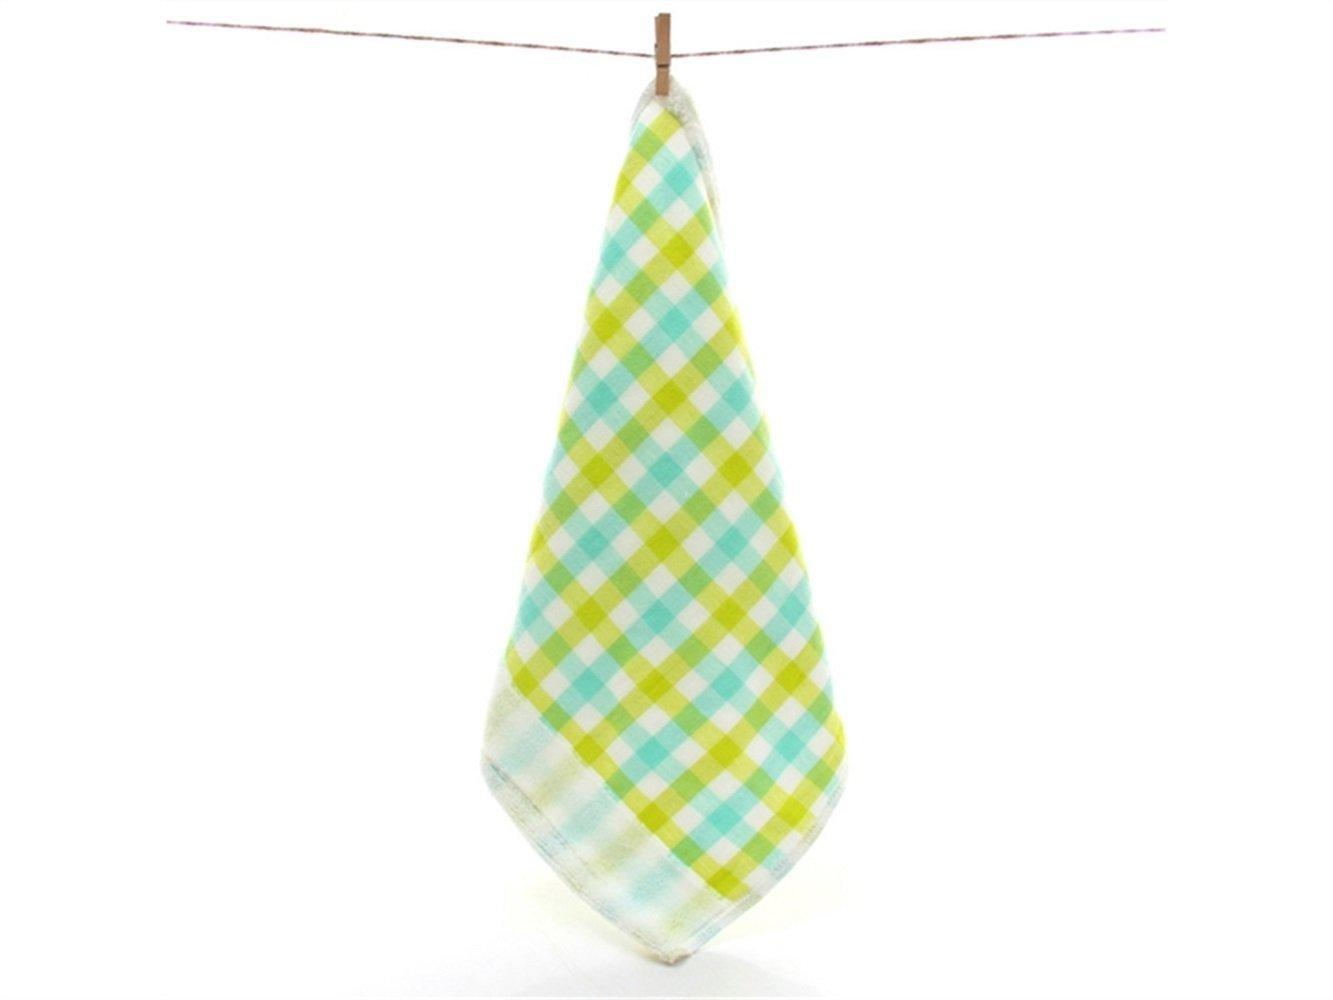 Zhisan Popular Lattice Cotton Baby Saliva Towel Children's Absorbent Wash Face Square Towel(Green)